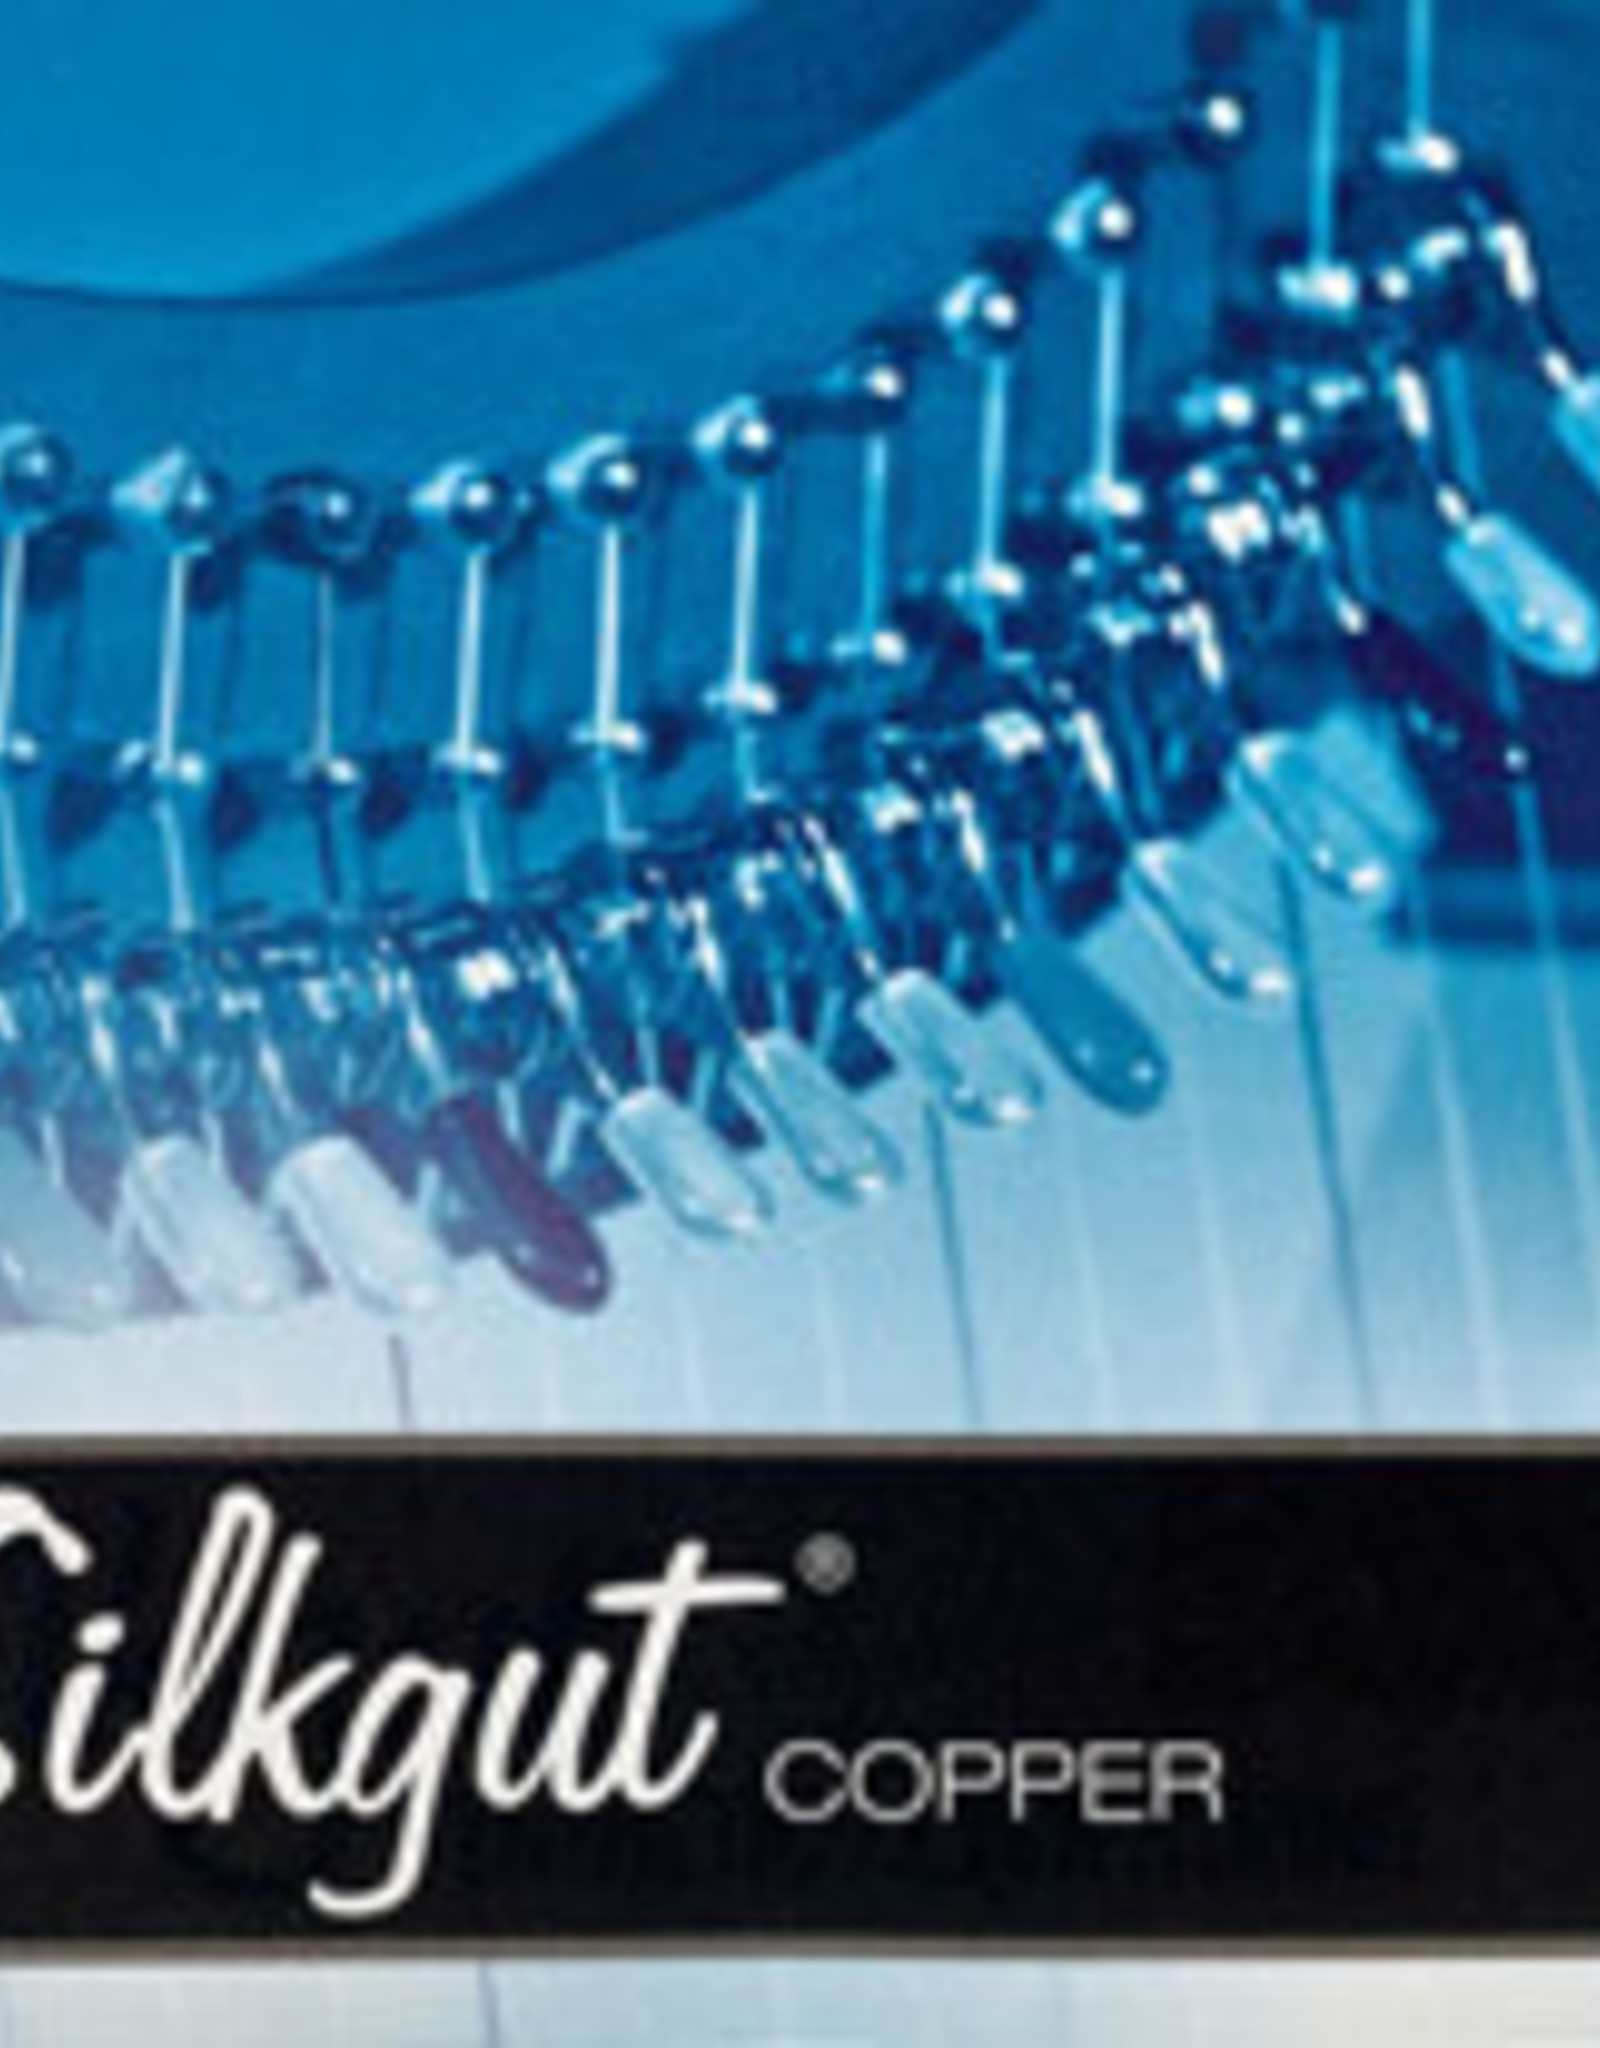 BOW BRAND  silkgut copper 27/4sol